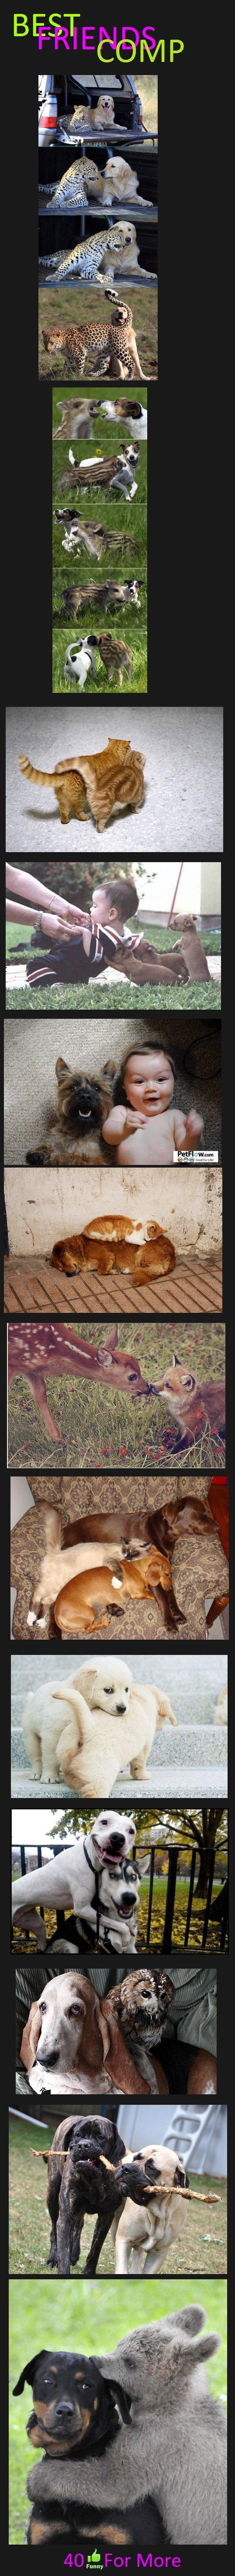 Best Friends!. Best friends part 2 and 3! funnyjunk.com/funny_pictures/2593752/Best+Friends+2/ funnyjunk.com/funny_pictures/2595143/Best+Friends+3/. BEST. Finally, they understand our love. best friends Animals